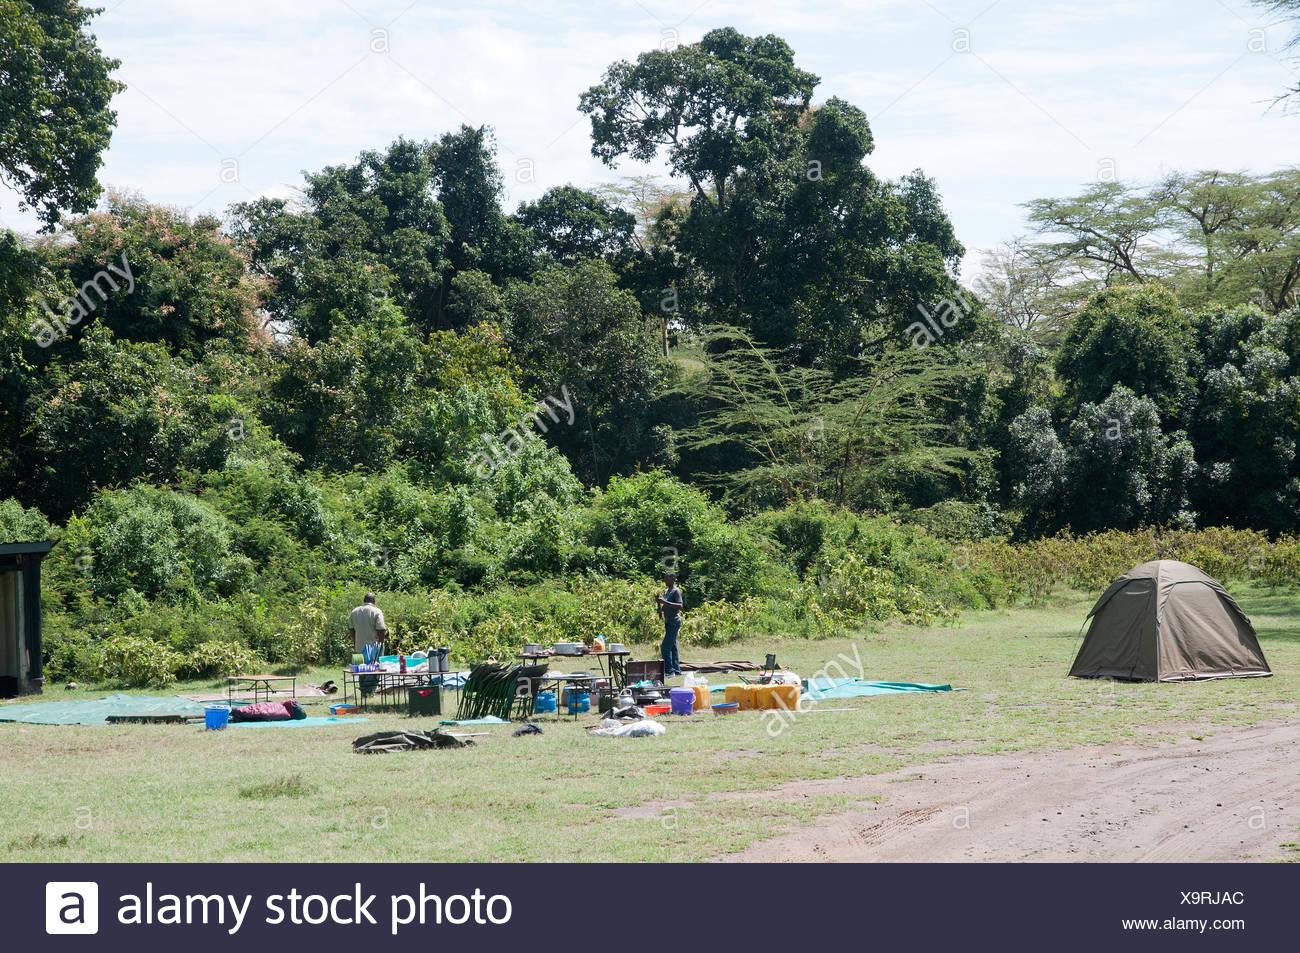 Staff working at striking camp and collecting kit on camp site near Makalia Falls in Lake Nakuru National Park Kenya East Africa - Stock Image